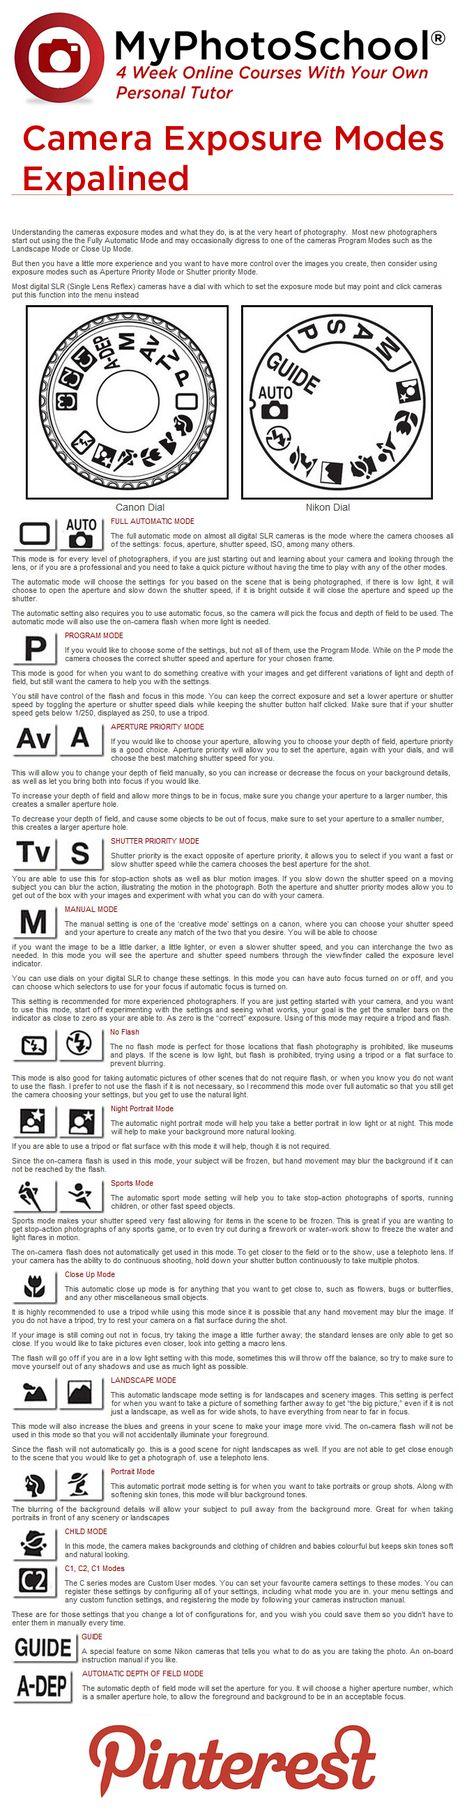 Camera exposure modes and program modes explained